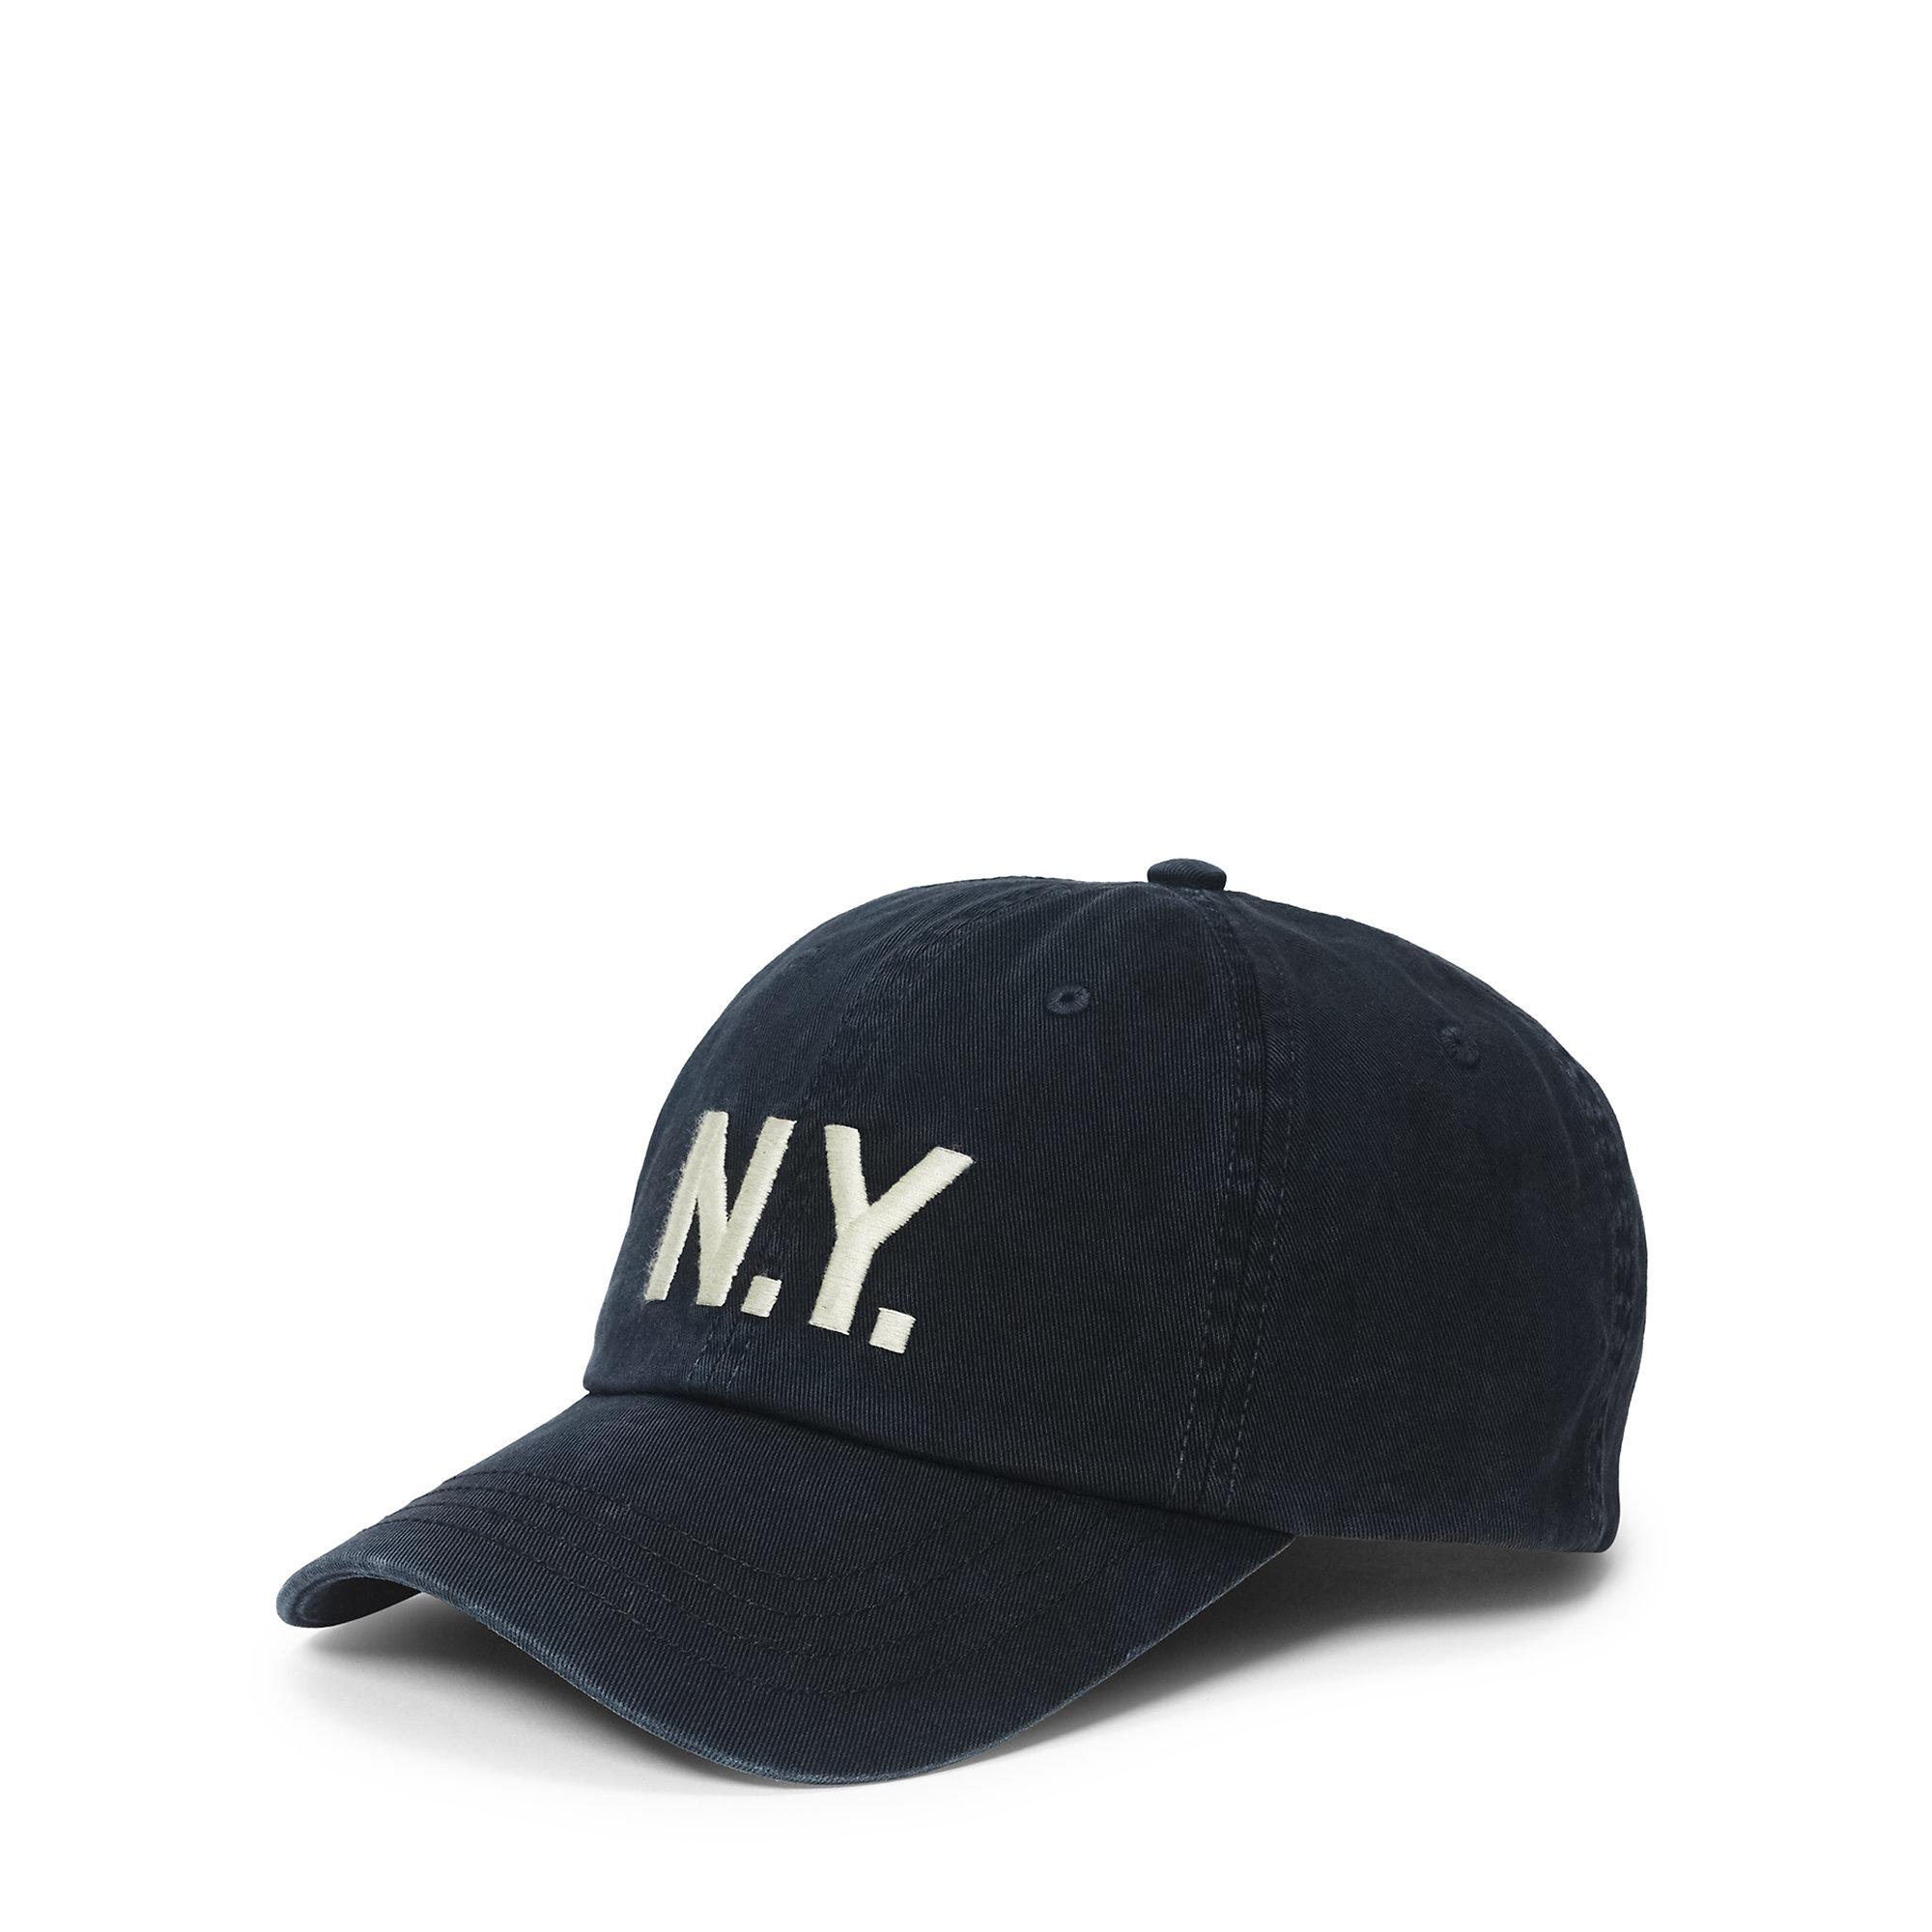 polo ralph lauren n y chino baseball cap in black for men. Black Bedroom Furniture Sets. Home Design Ideas